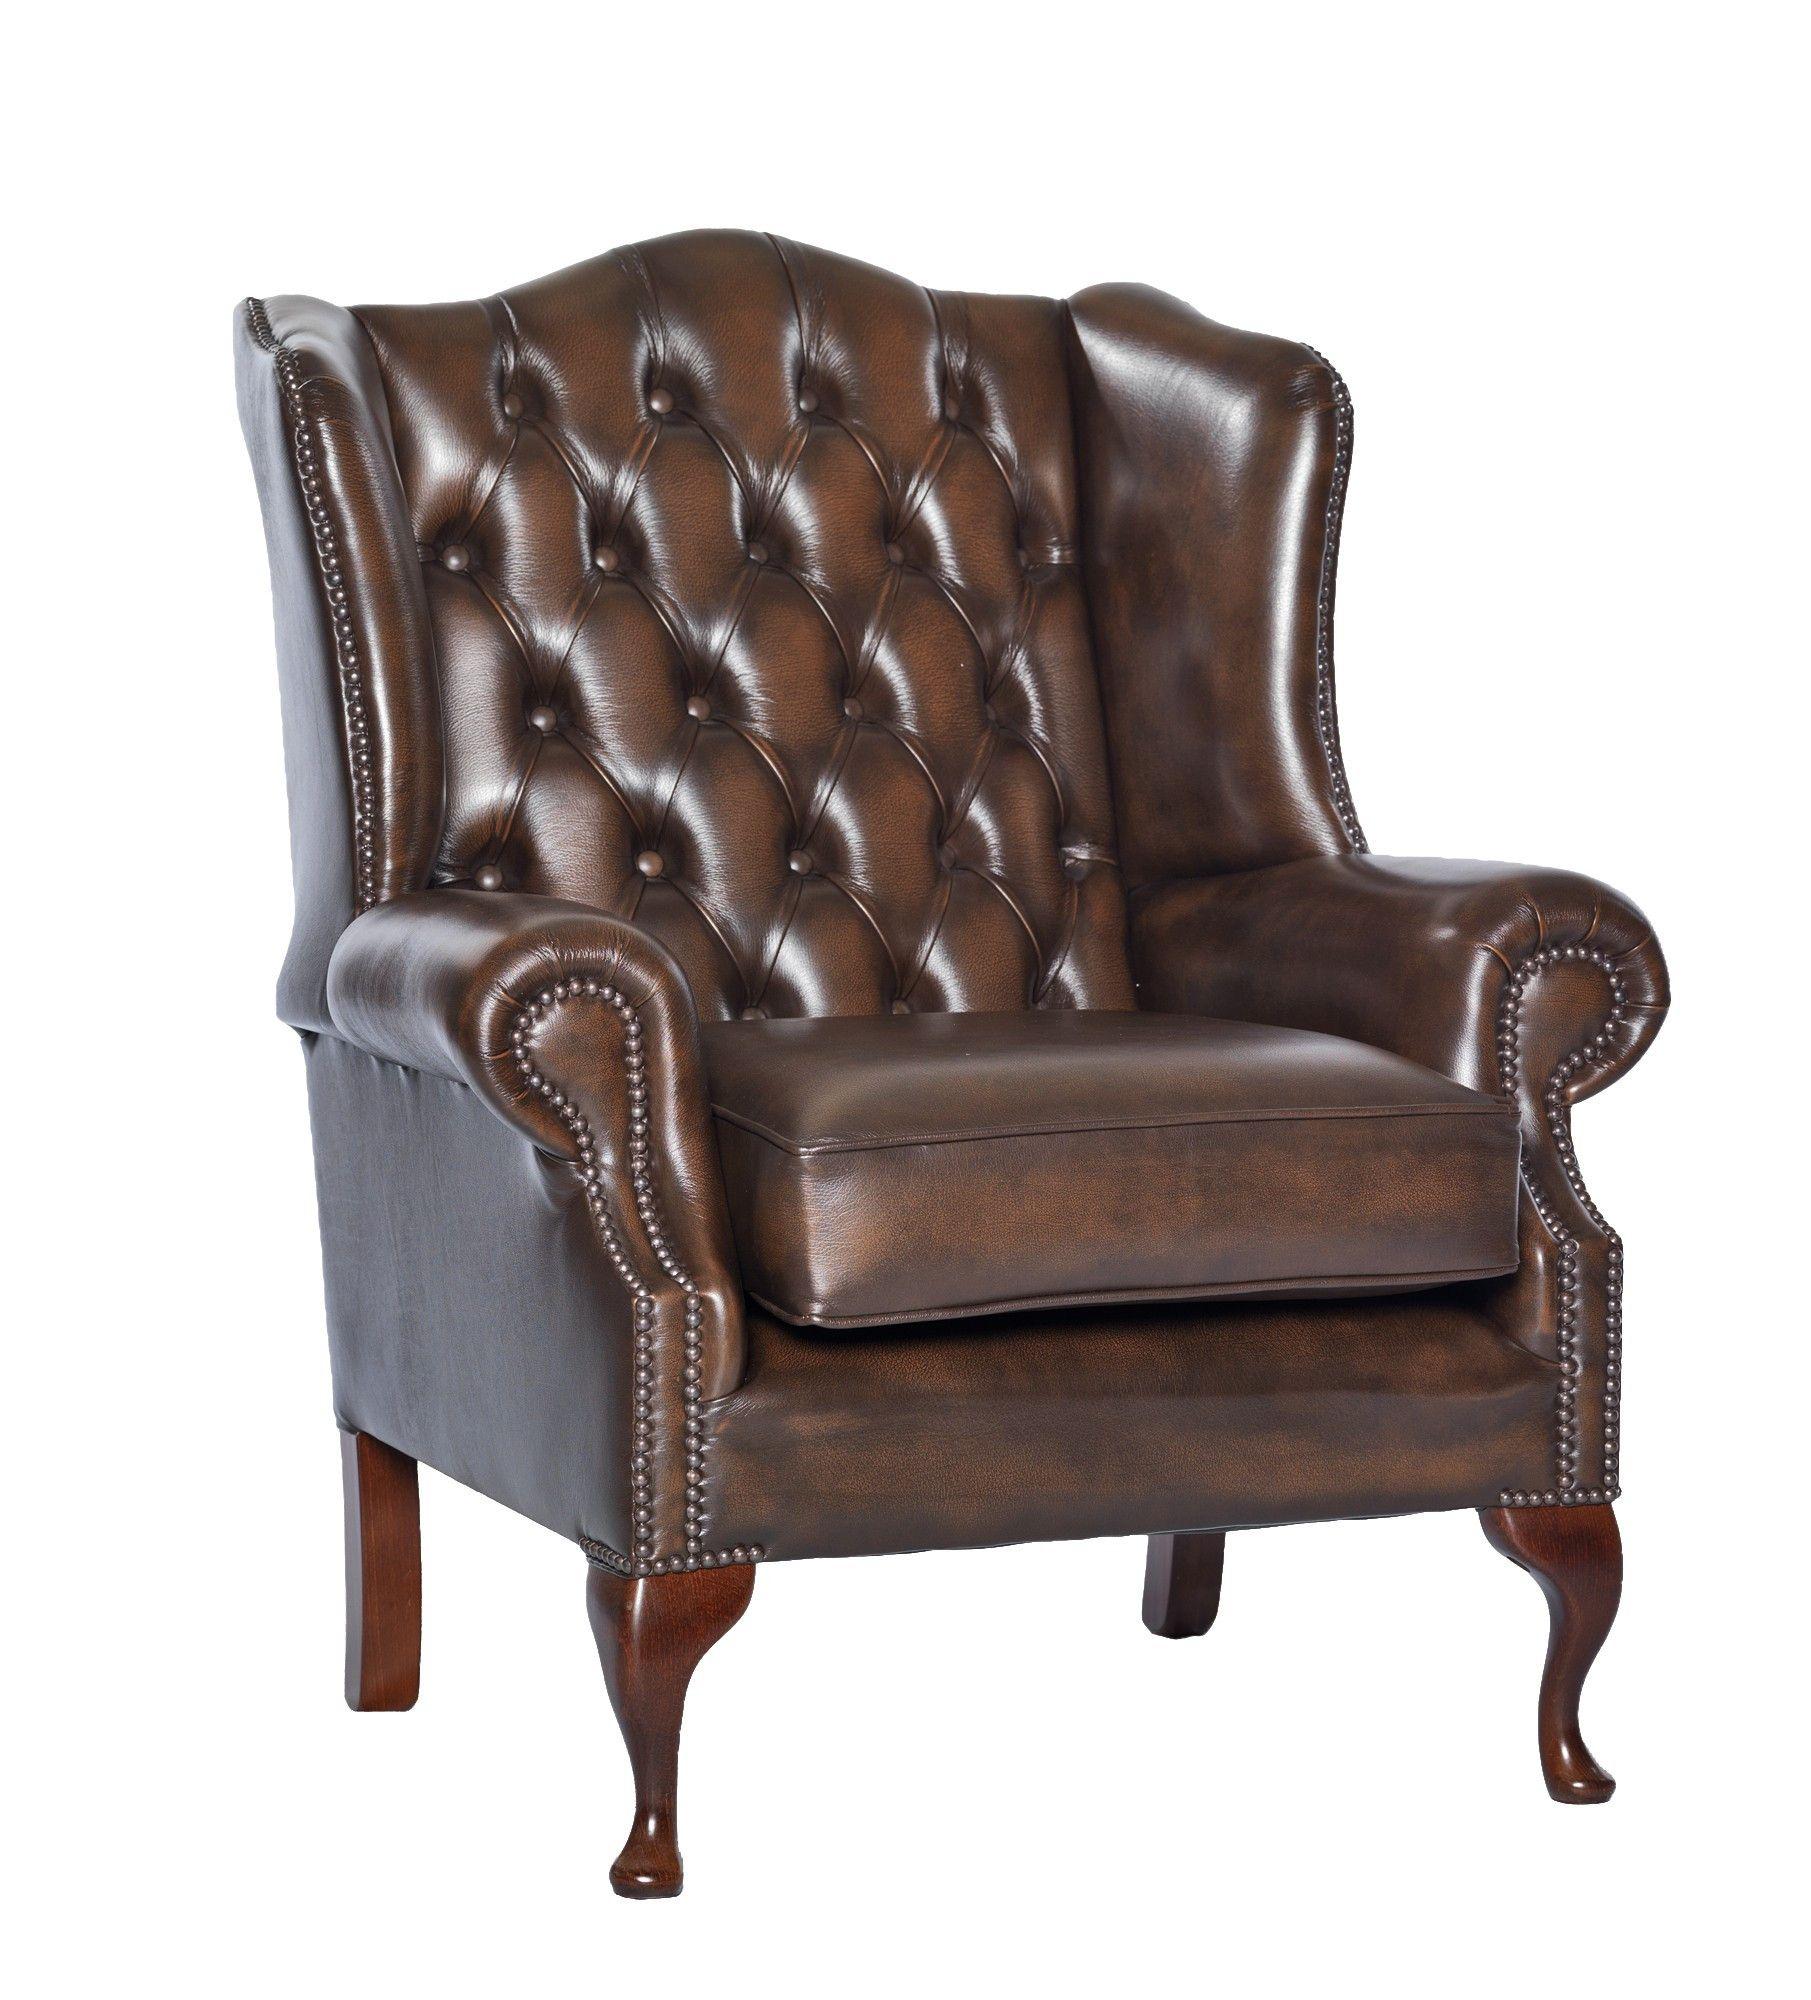 Galerie Mobel Orlando Rustikalen Mobeln Nz Bob Mitchell Gold Dallas Designer Mobel Verschiedene Arten V Leather Wingback Chair Wingback Chair Leather Armchair